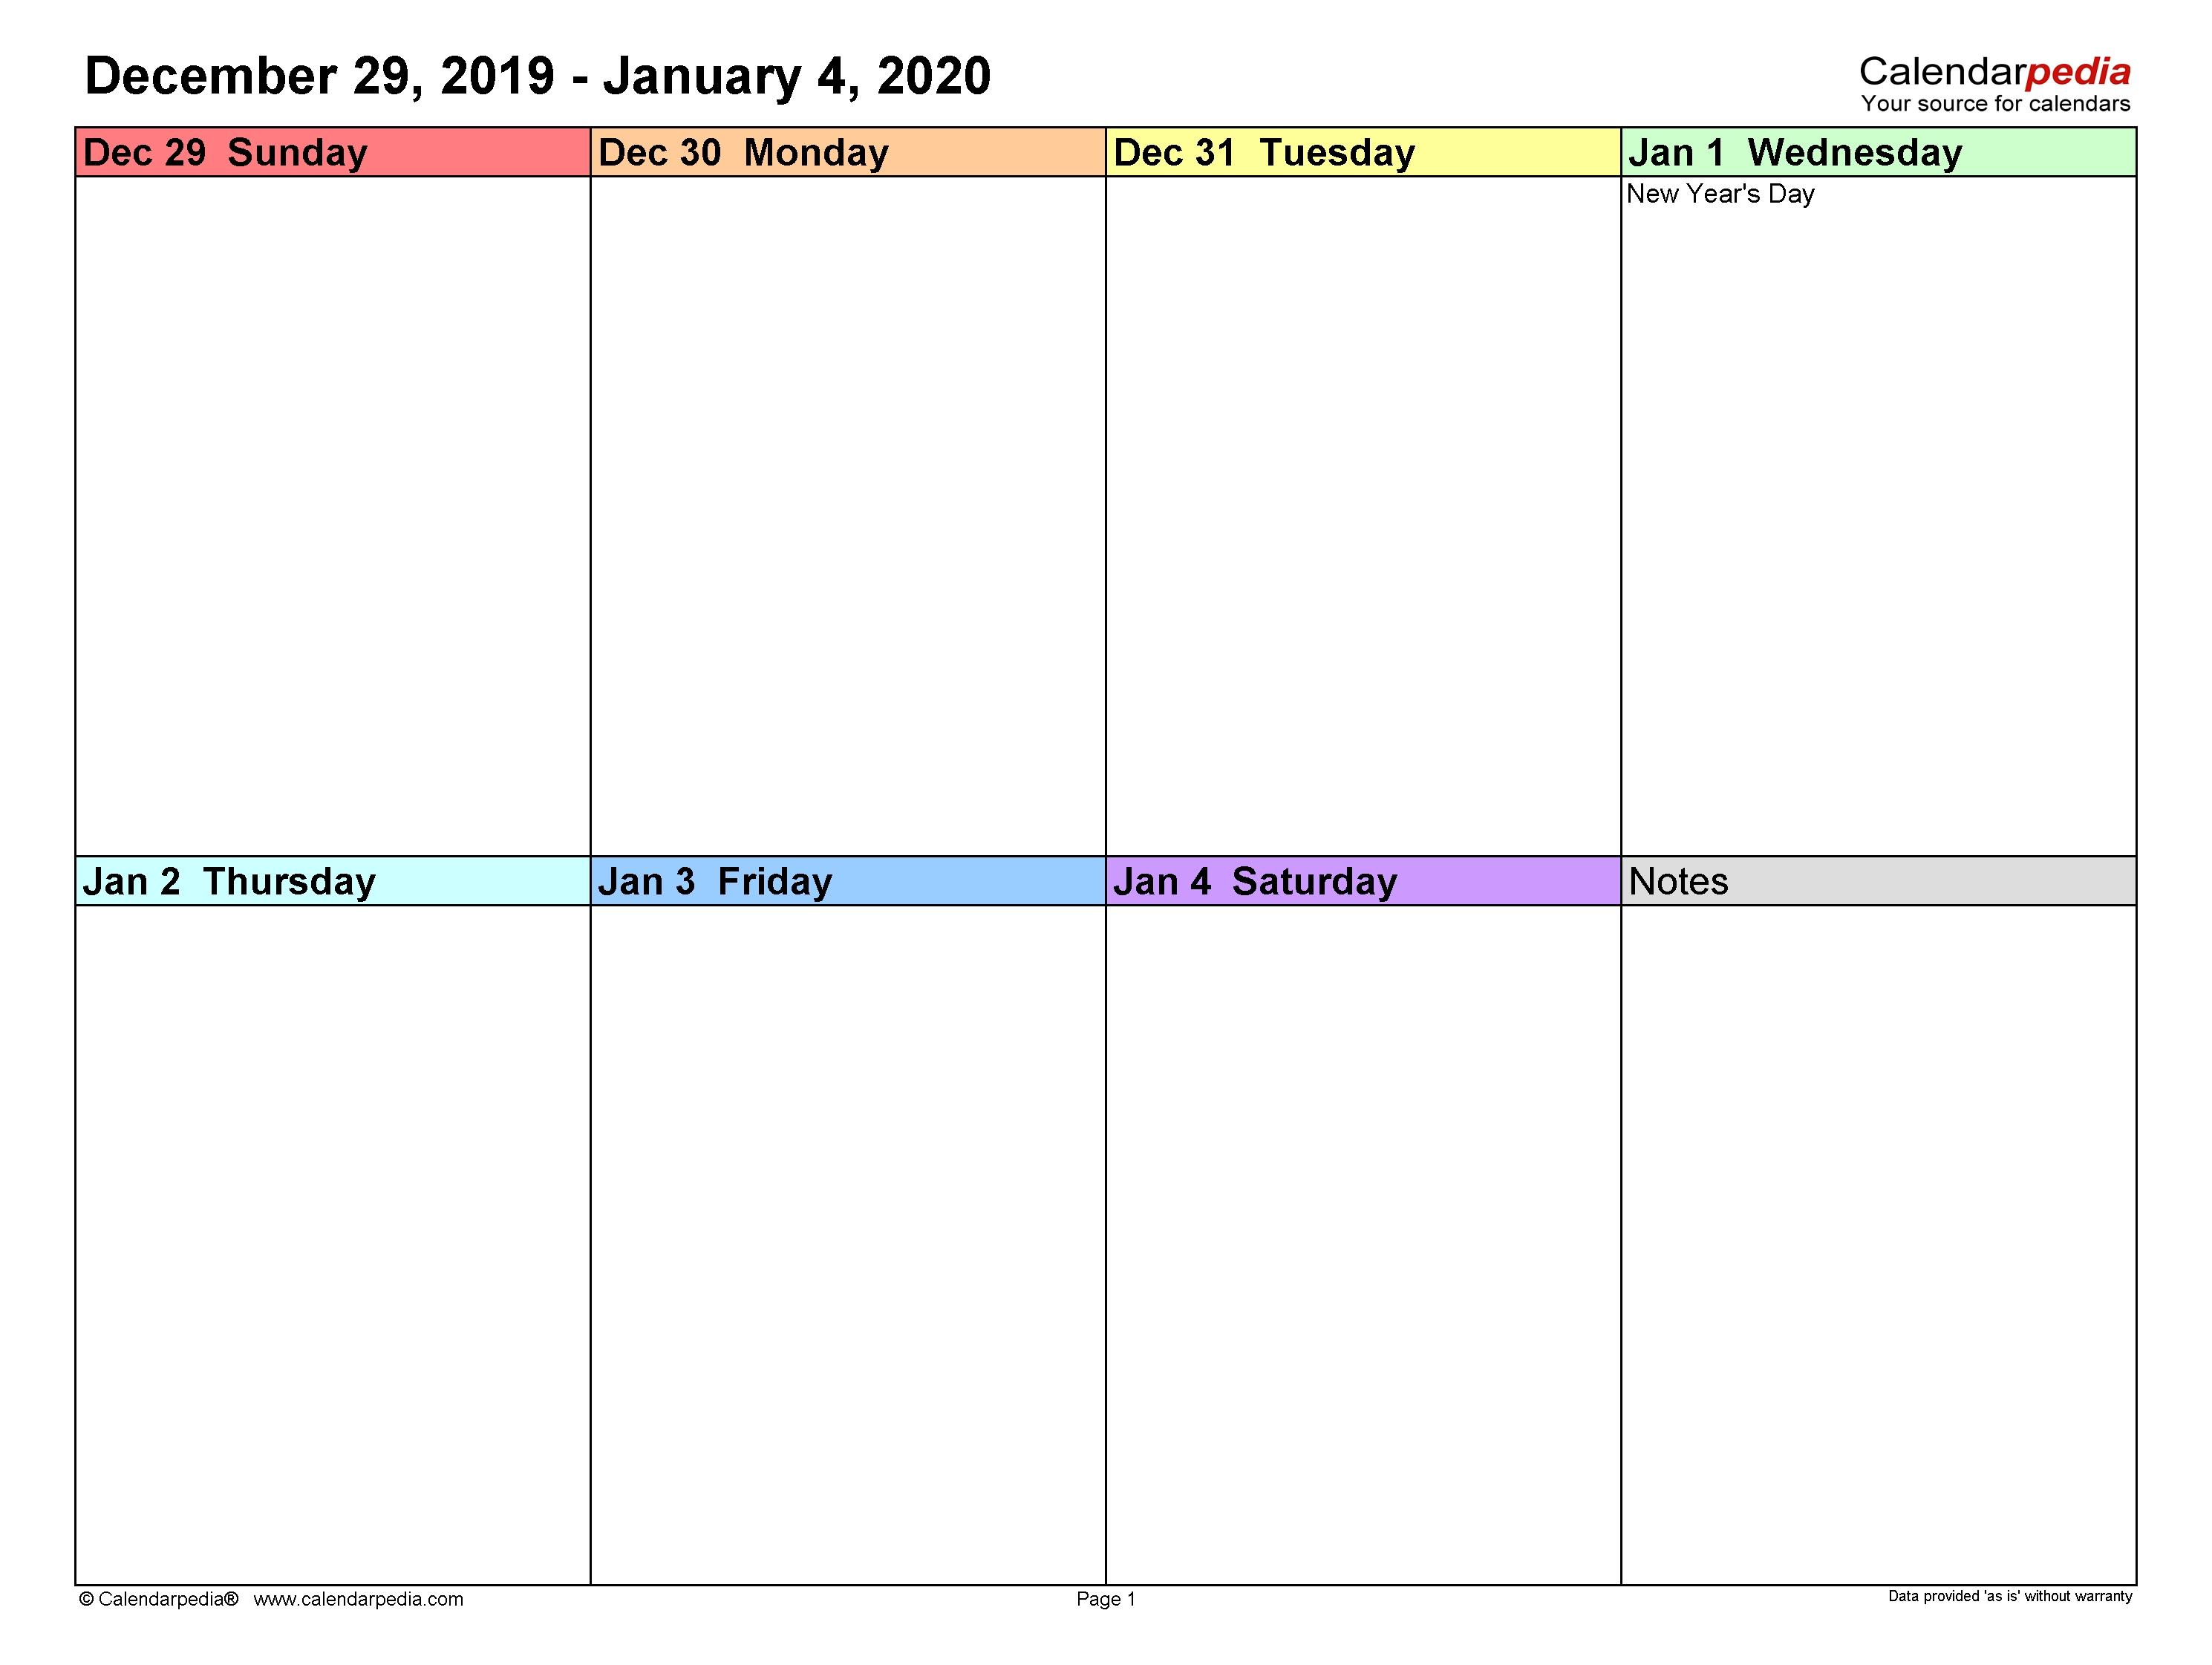 Weekly Calendars 2020 For Word - 12 Free Printable Templates Free Calendar Weekly Template